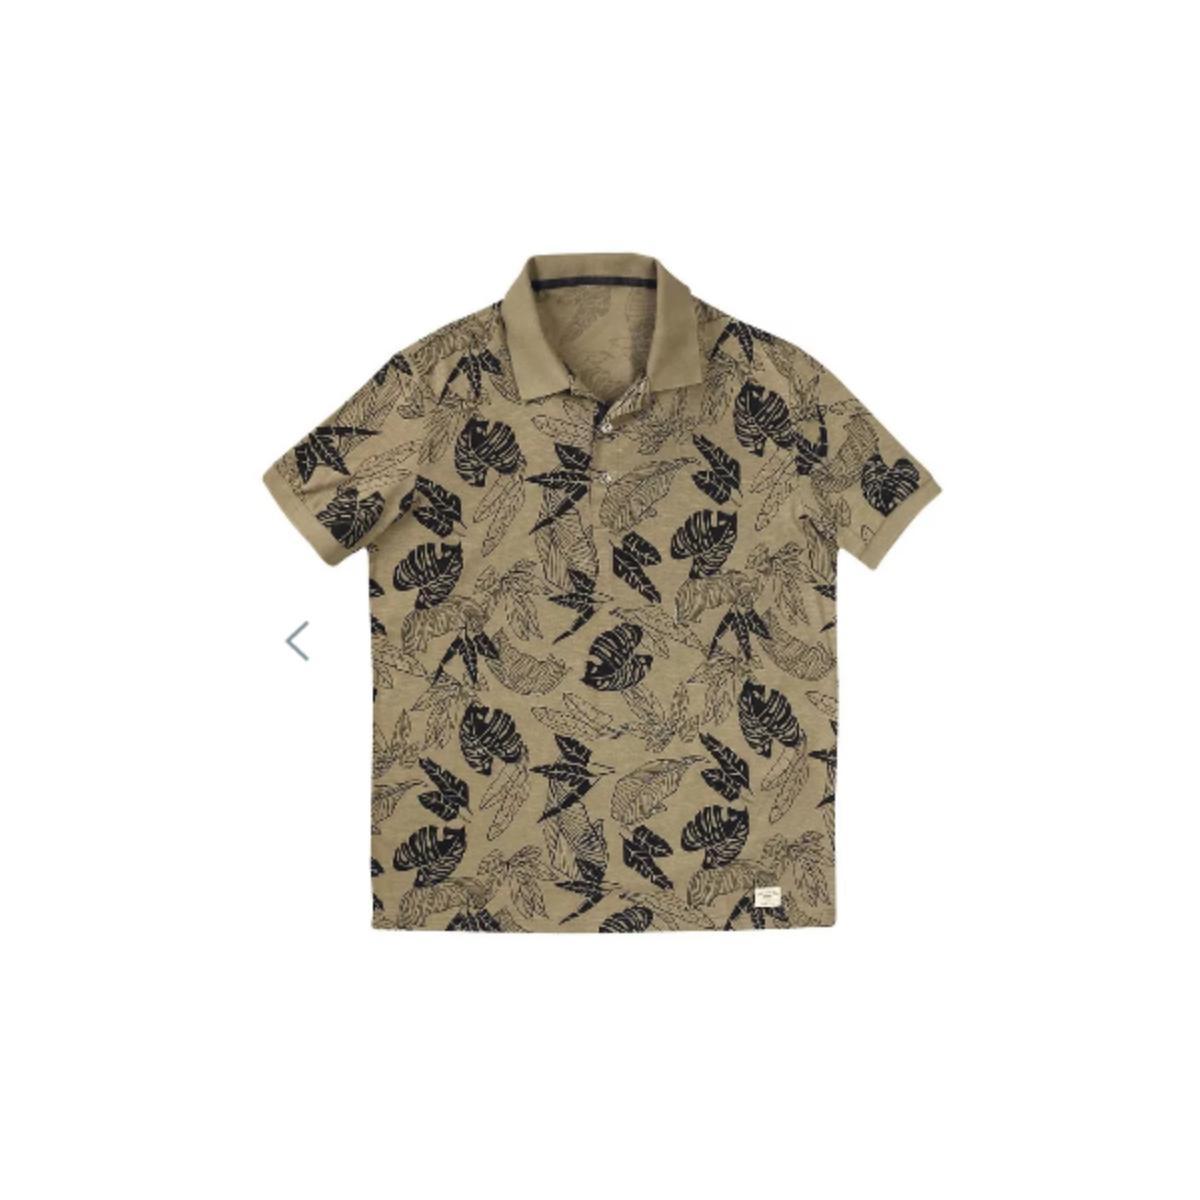 Camisa Masculina Hering 3m3n 1hen Areia/preto